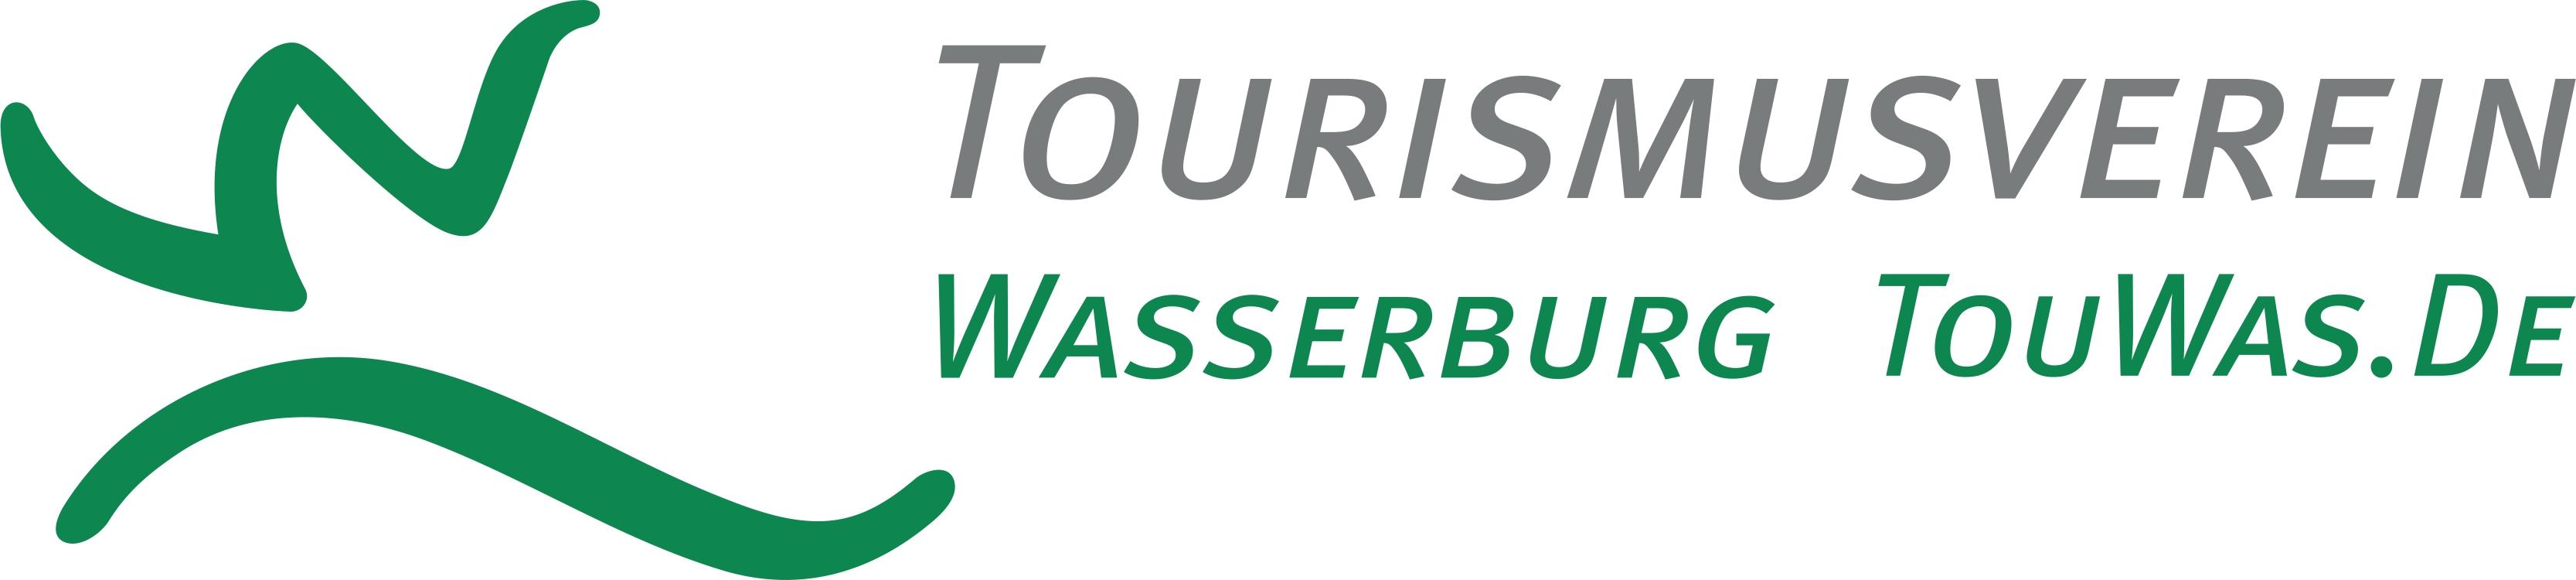 Tourismusverein Wasserburg e.V.